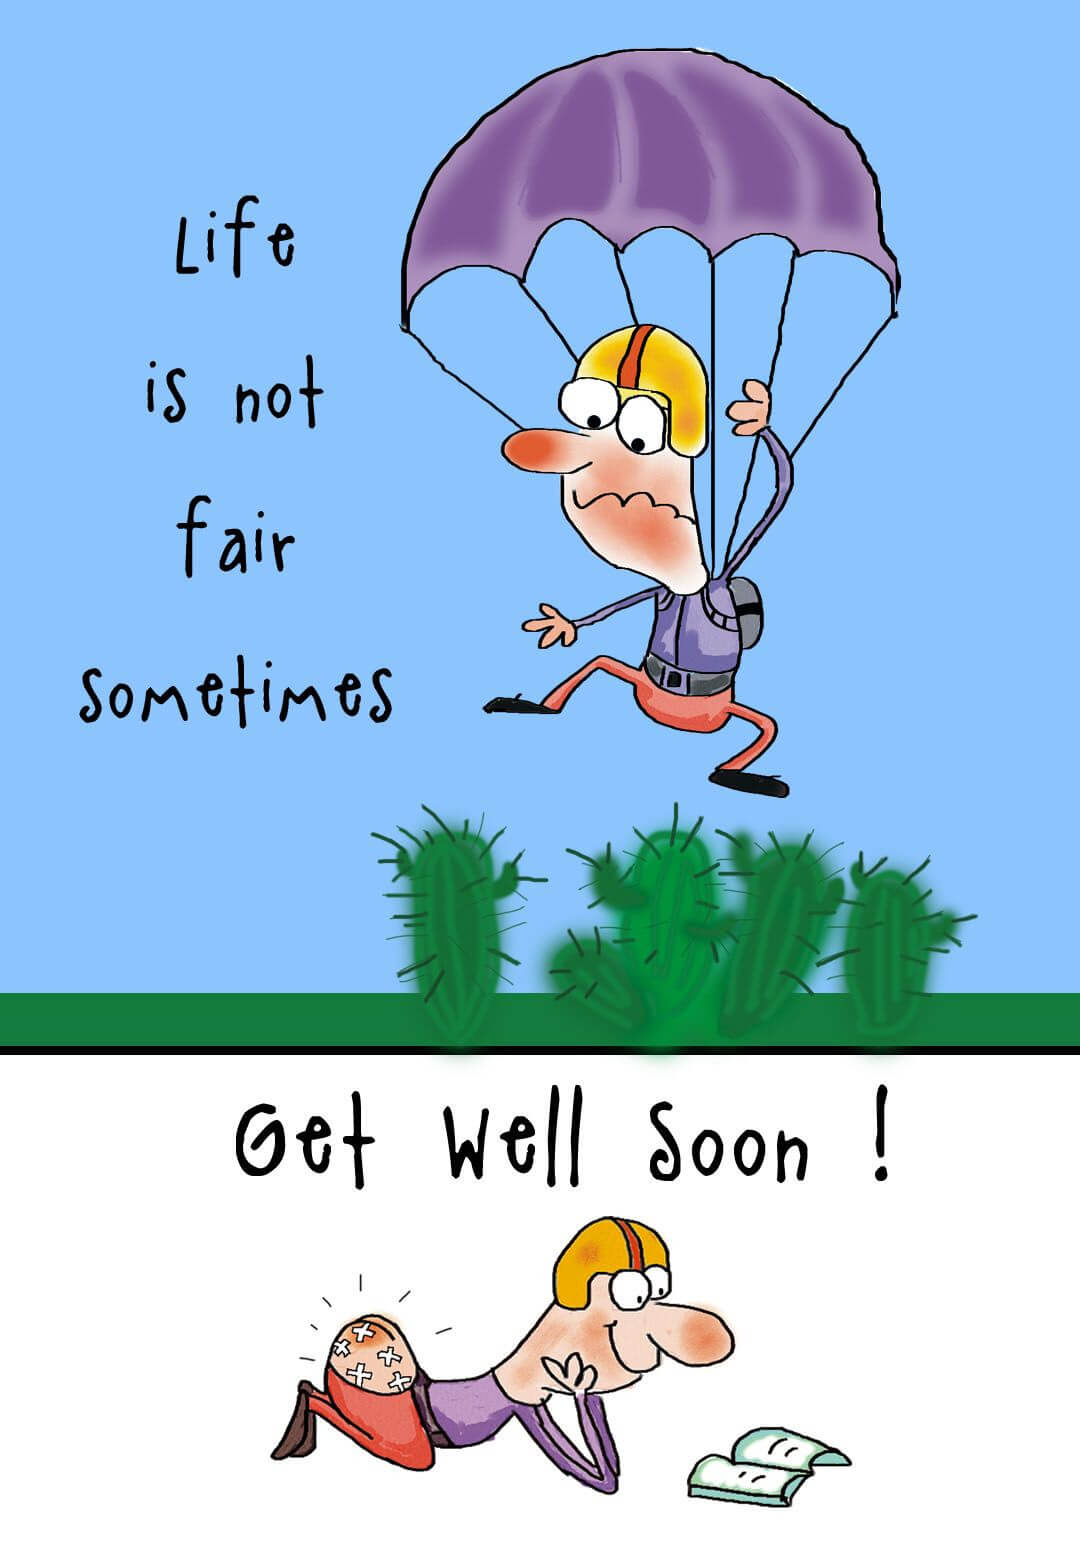 Free Printable Get Well Soon Greeting Card | Get Well Soon intended for Get Well Soon Card Template